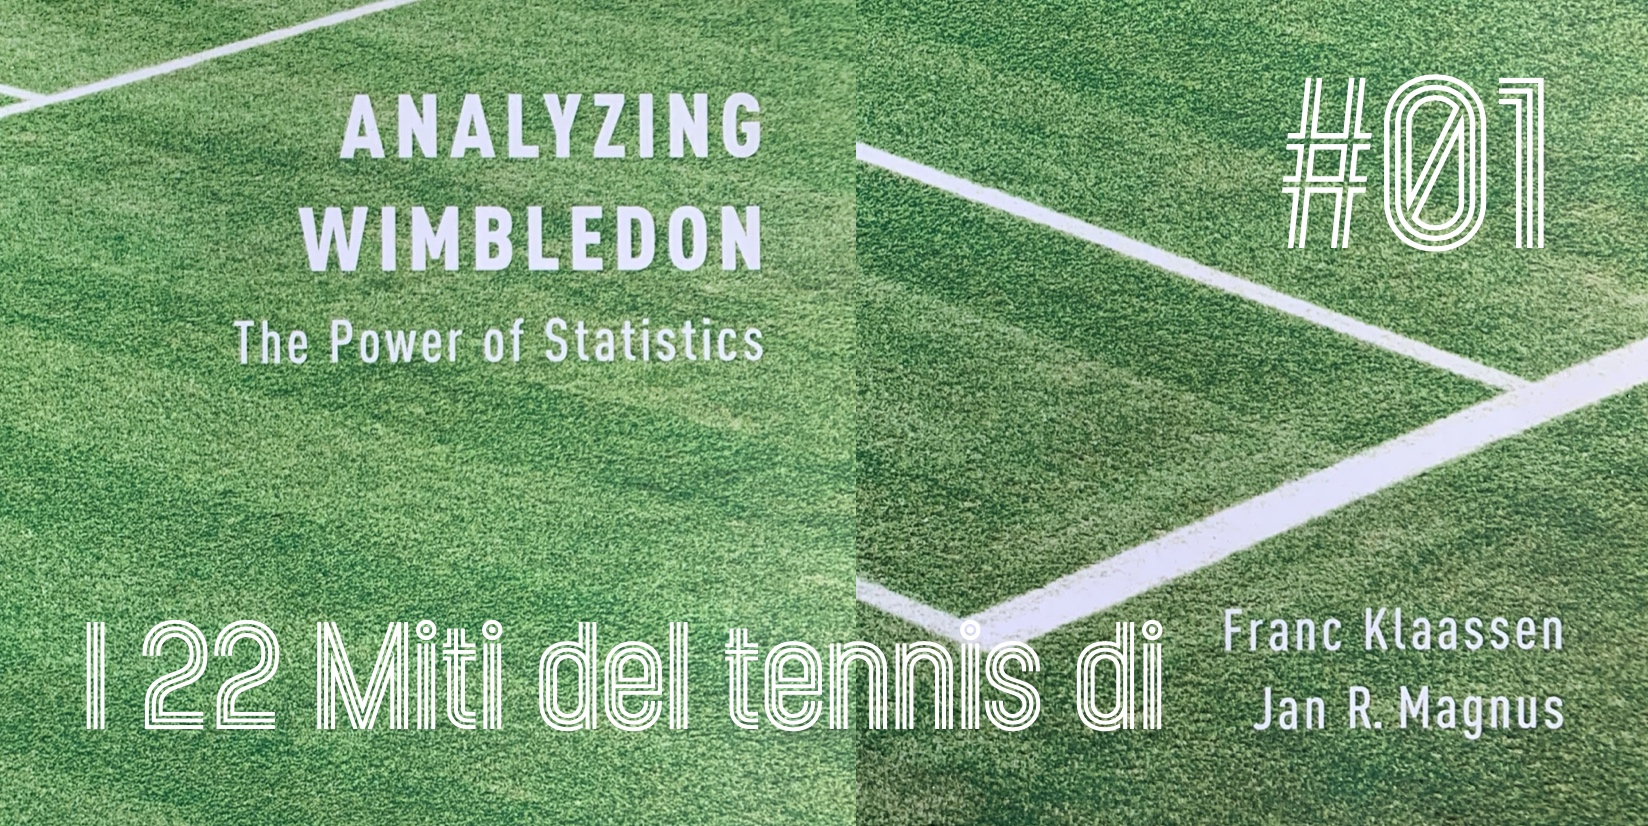 I 22 miti del tennis di Klaassen & Magnus – Mito 1 - settesei.it